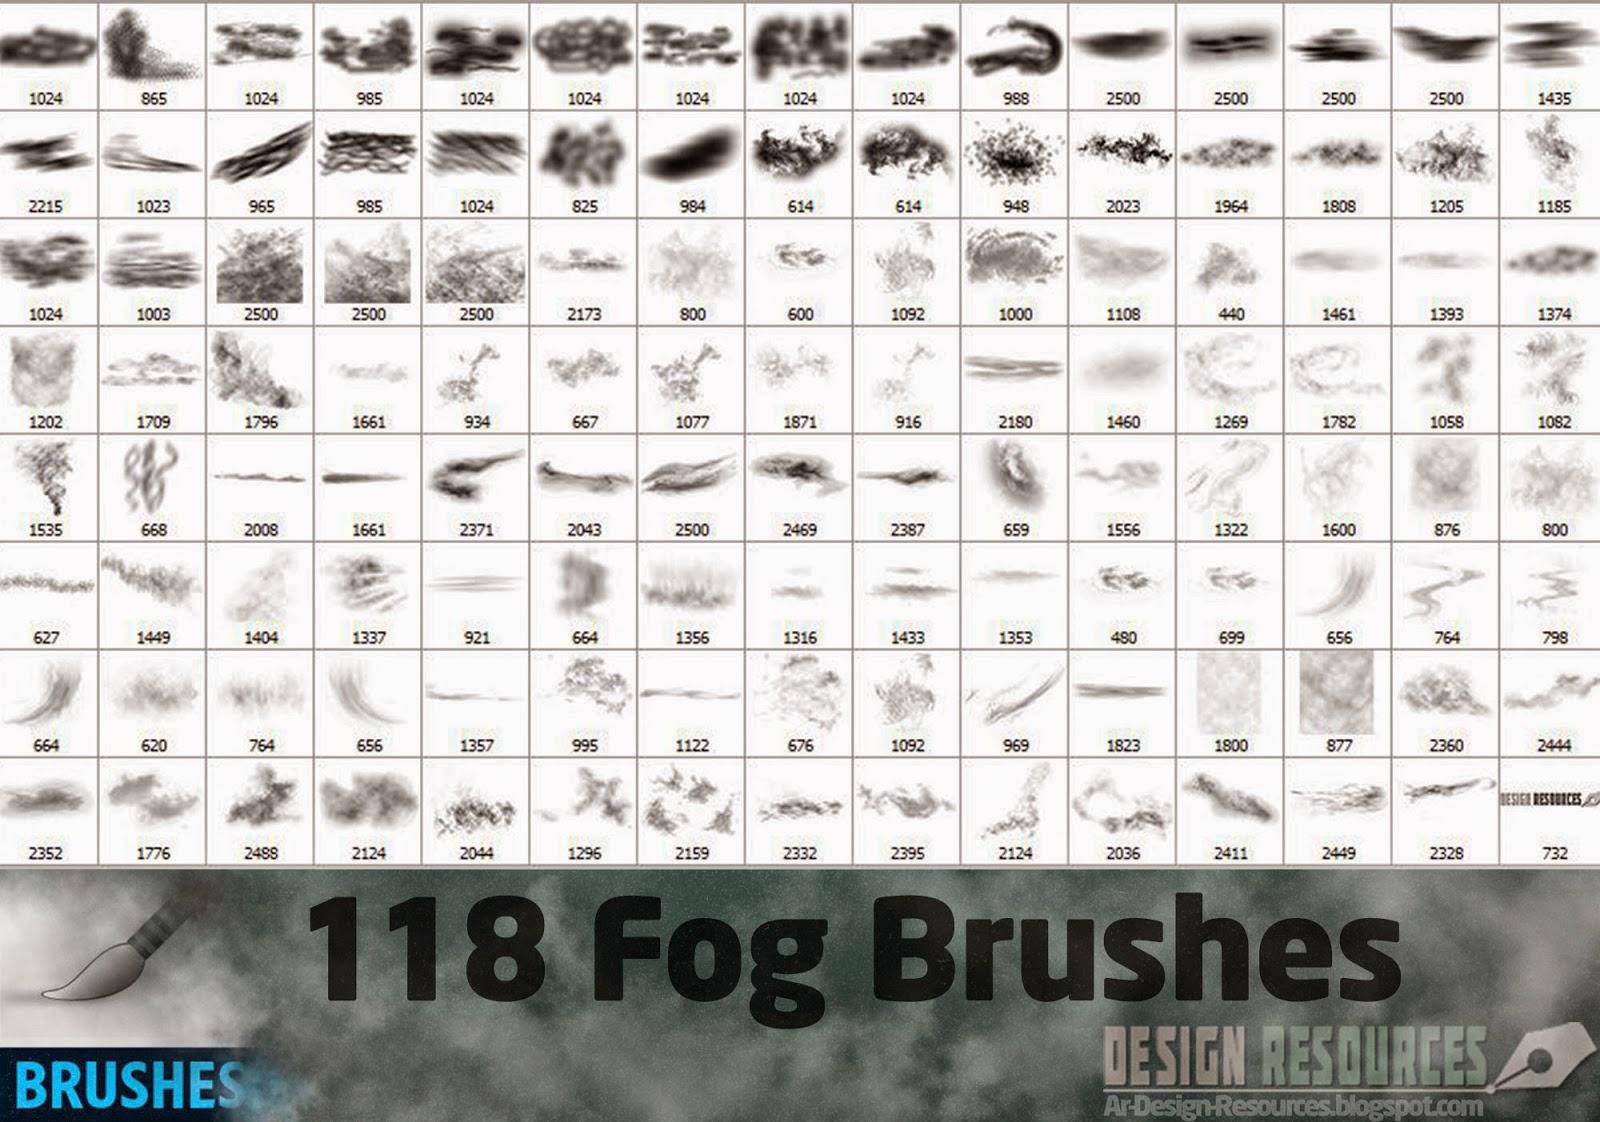 http://4.bp.blogspot.com/-6QLIwuJCo1M/VEoy1IL1P0I/AAAAAAAABCI/fmlOJLEhOhQ/s1600/118_Fog-Brushes_Ar-Design-Resources_ThisPreview.jpg